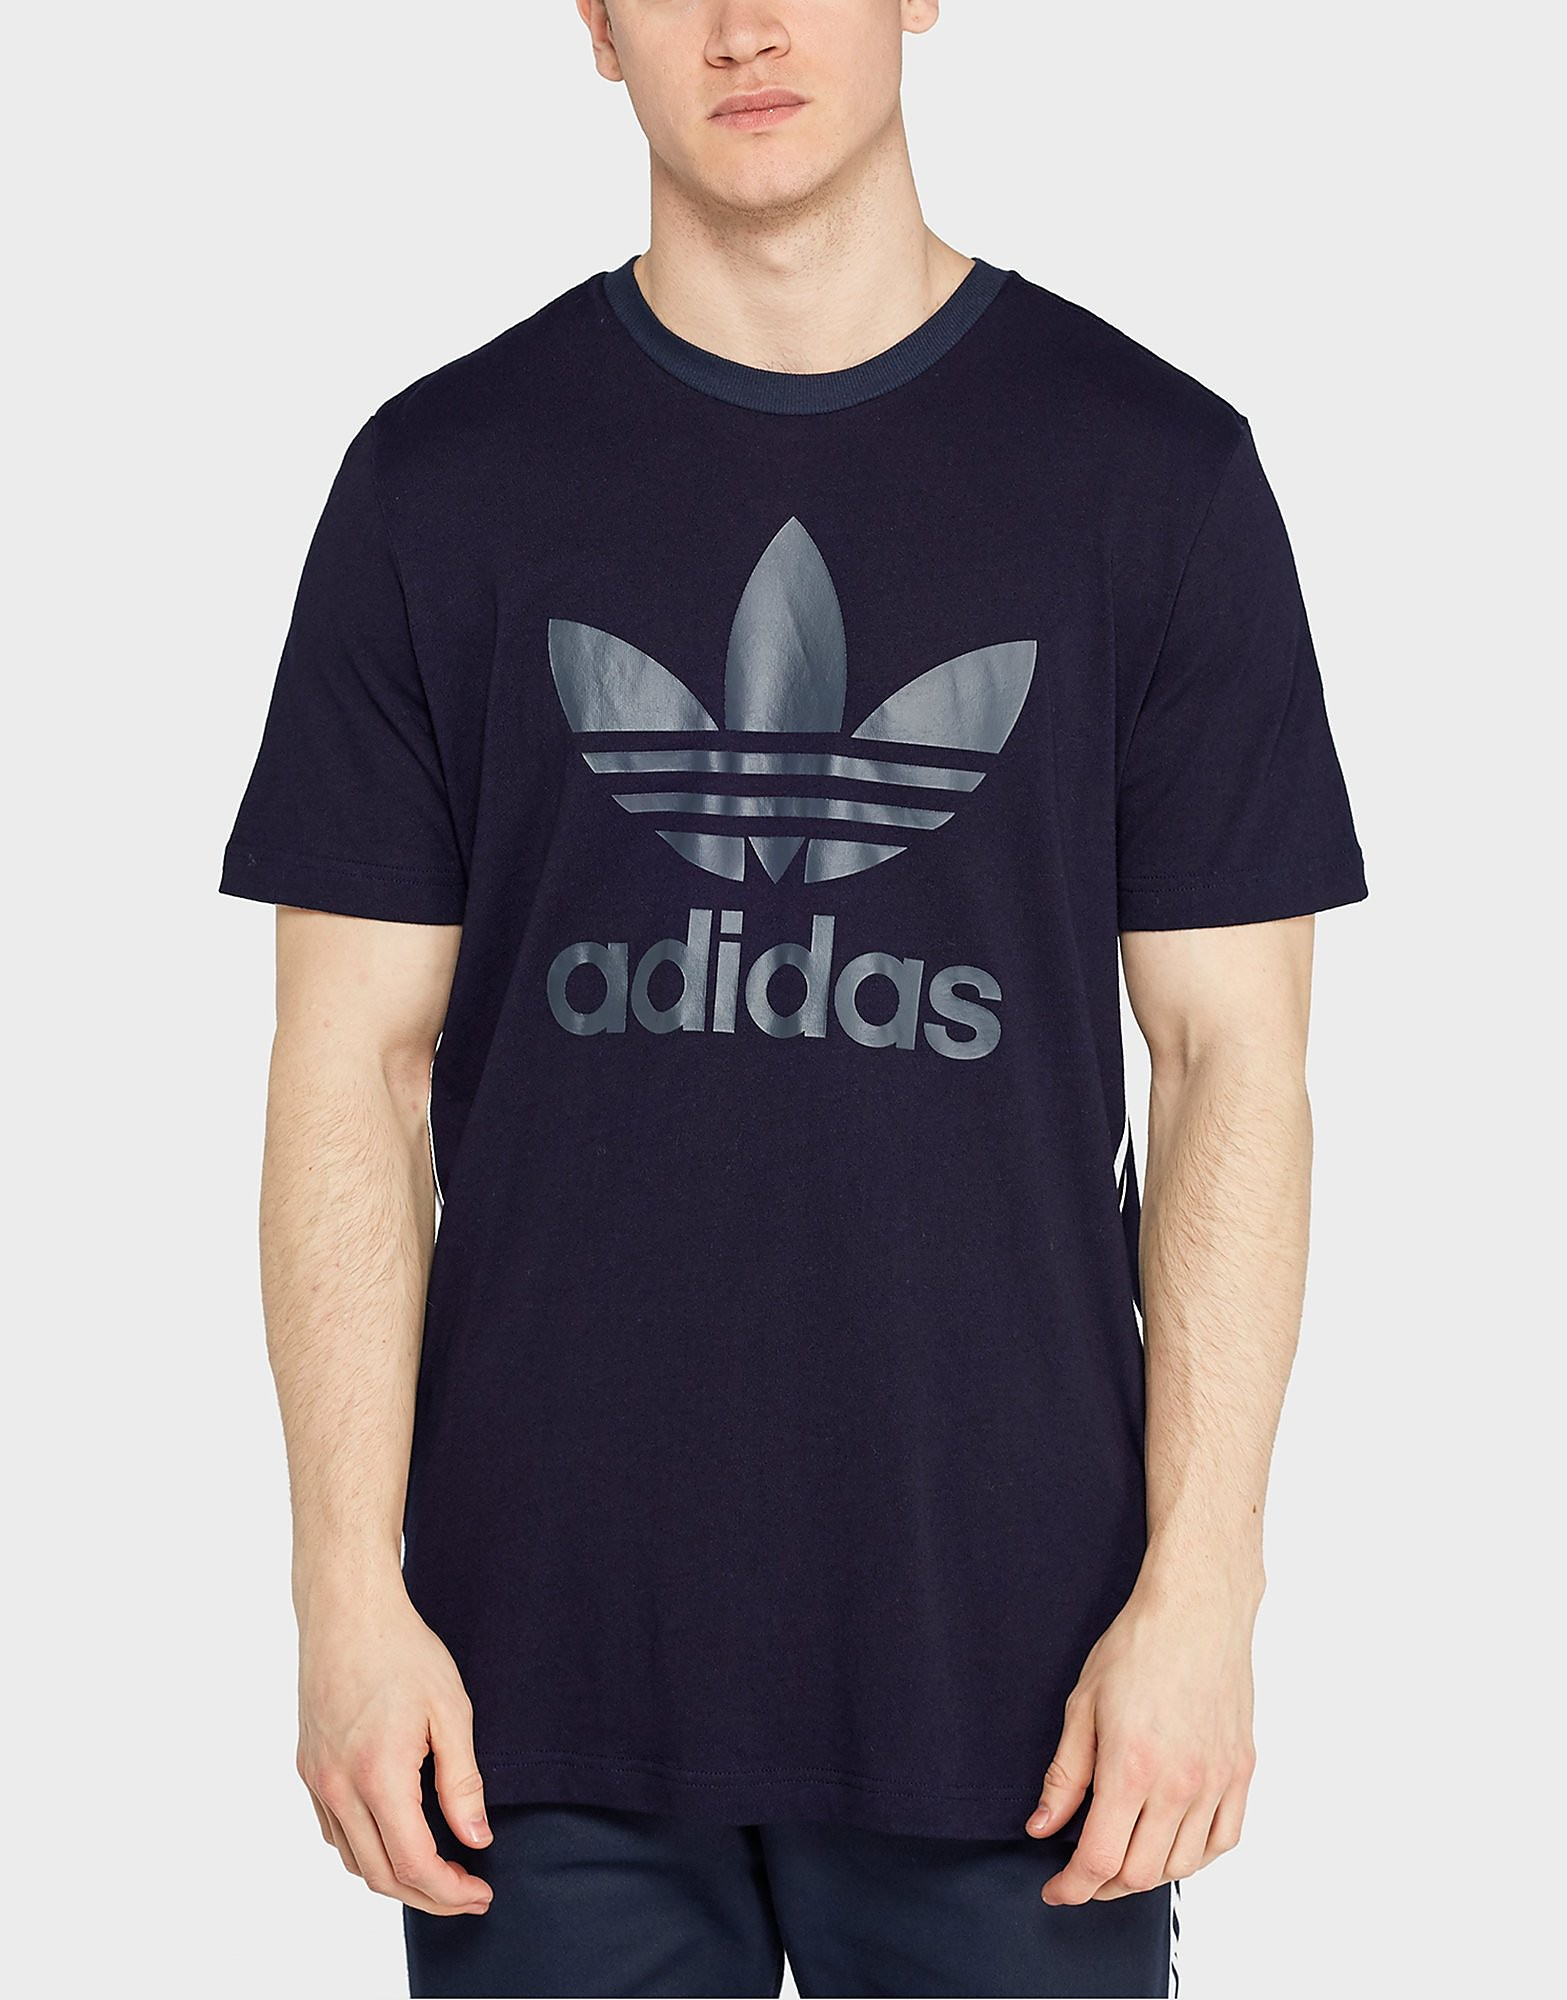 adidas Originals Logo Short Sleeve T-Shirt